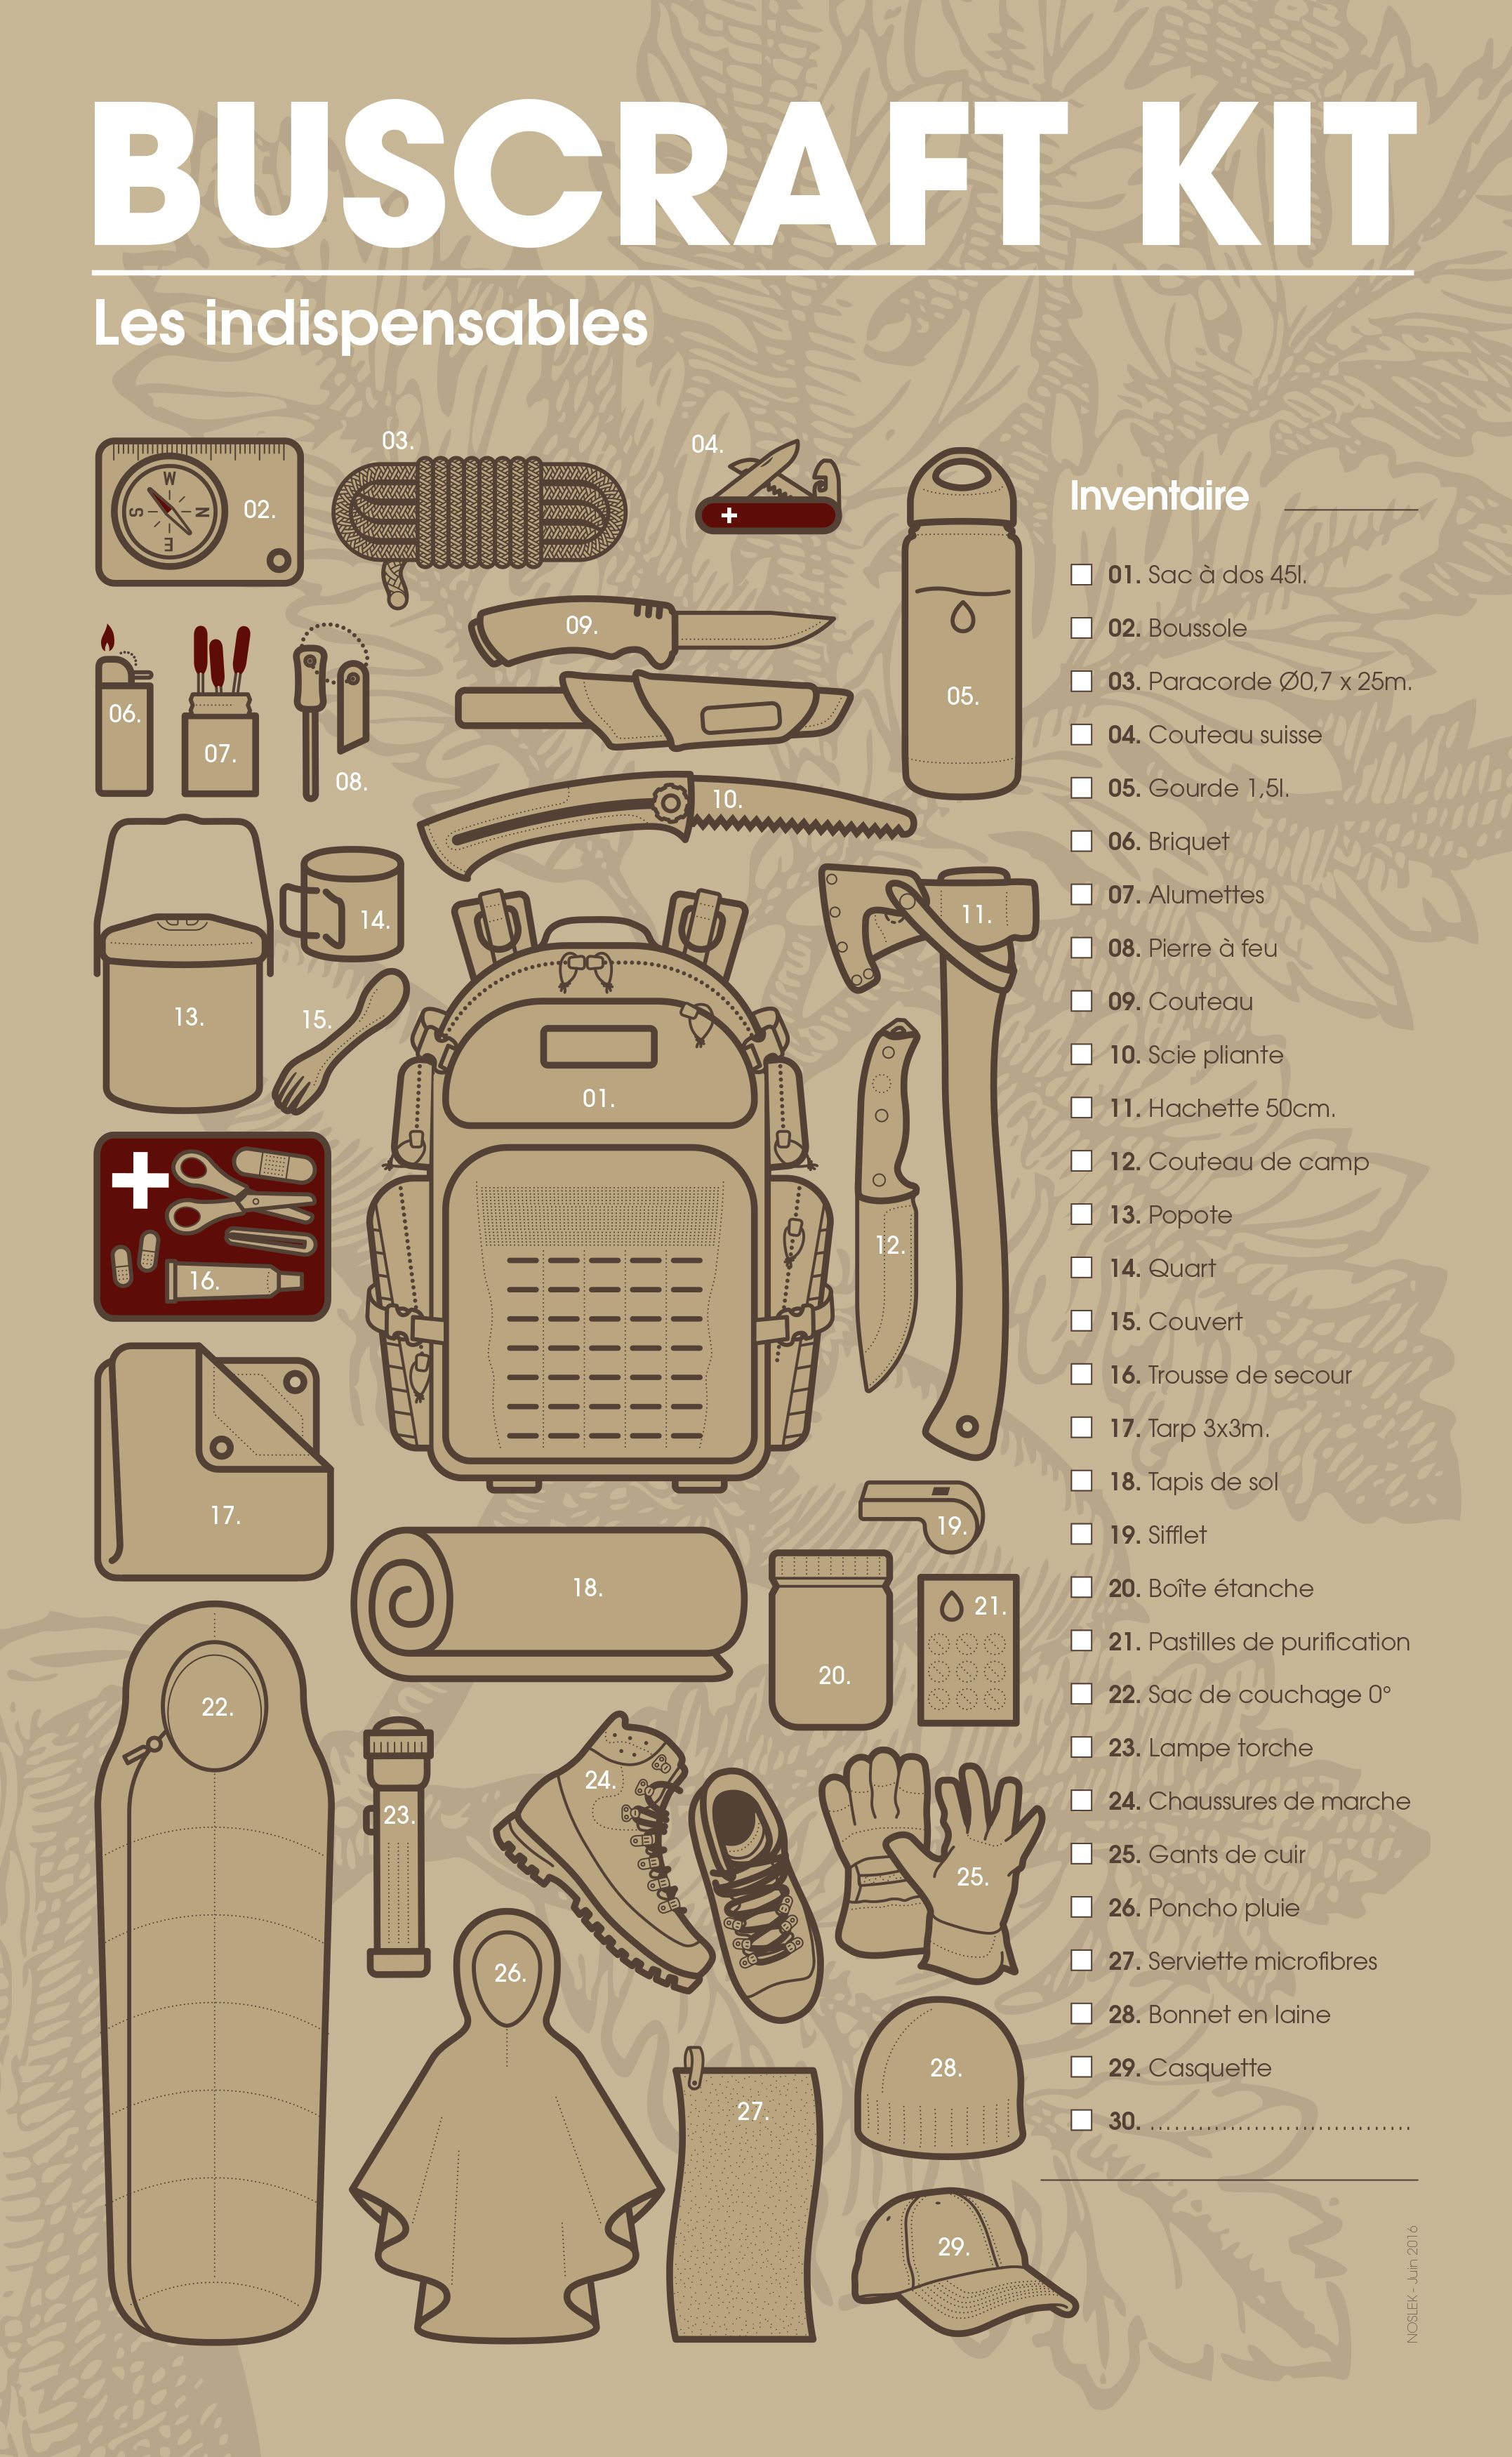 BUSHCRAFT KIT - Inventaire du matériel incontournable. #bushcraft #survie